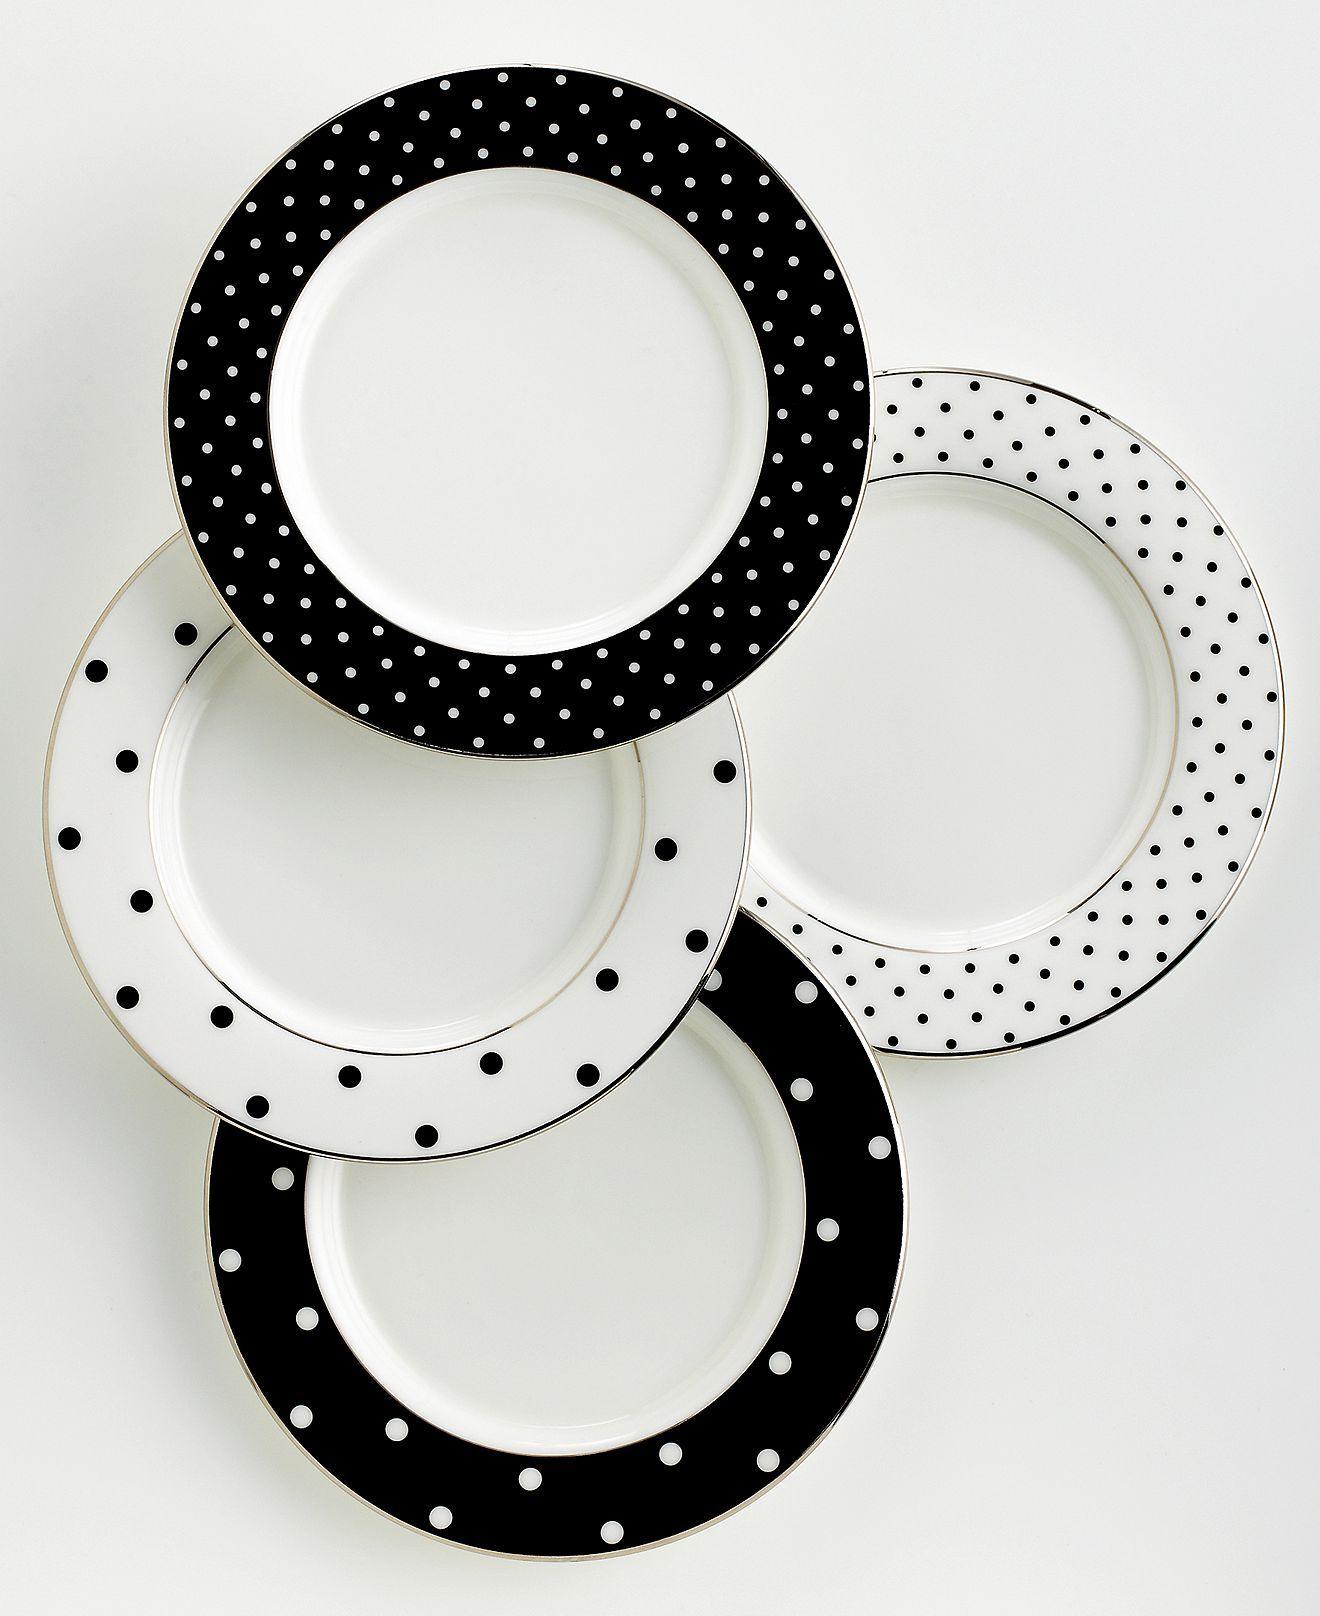 kate spade new york Dinnerware, Set of 4 Larabee Road Polka Dot Tidbit Plates - Fine China - Dining & Entertaining - Macy's